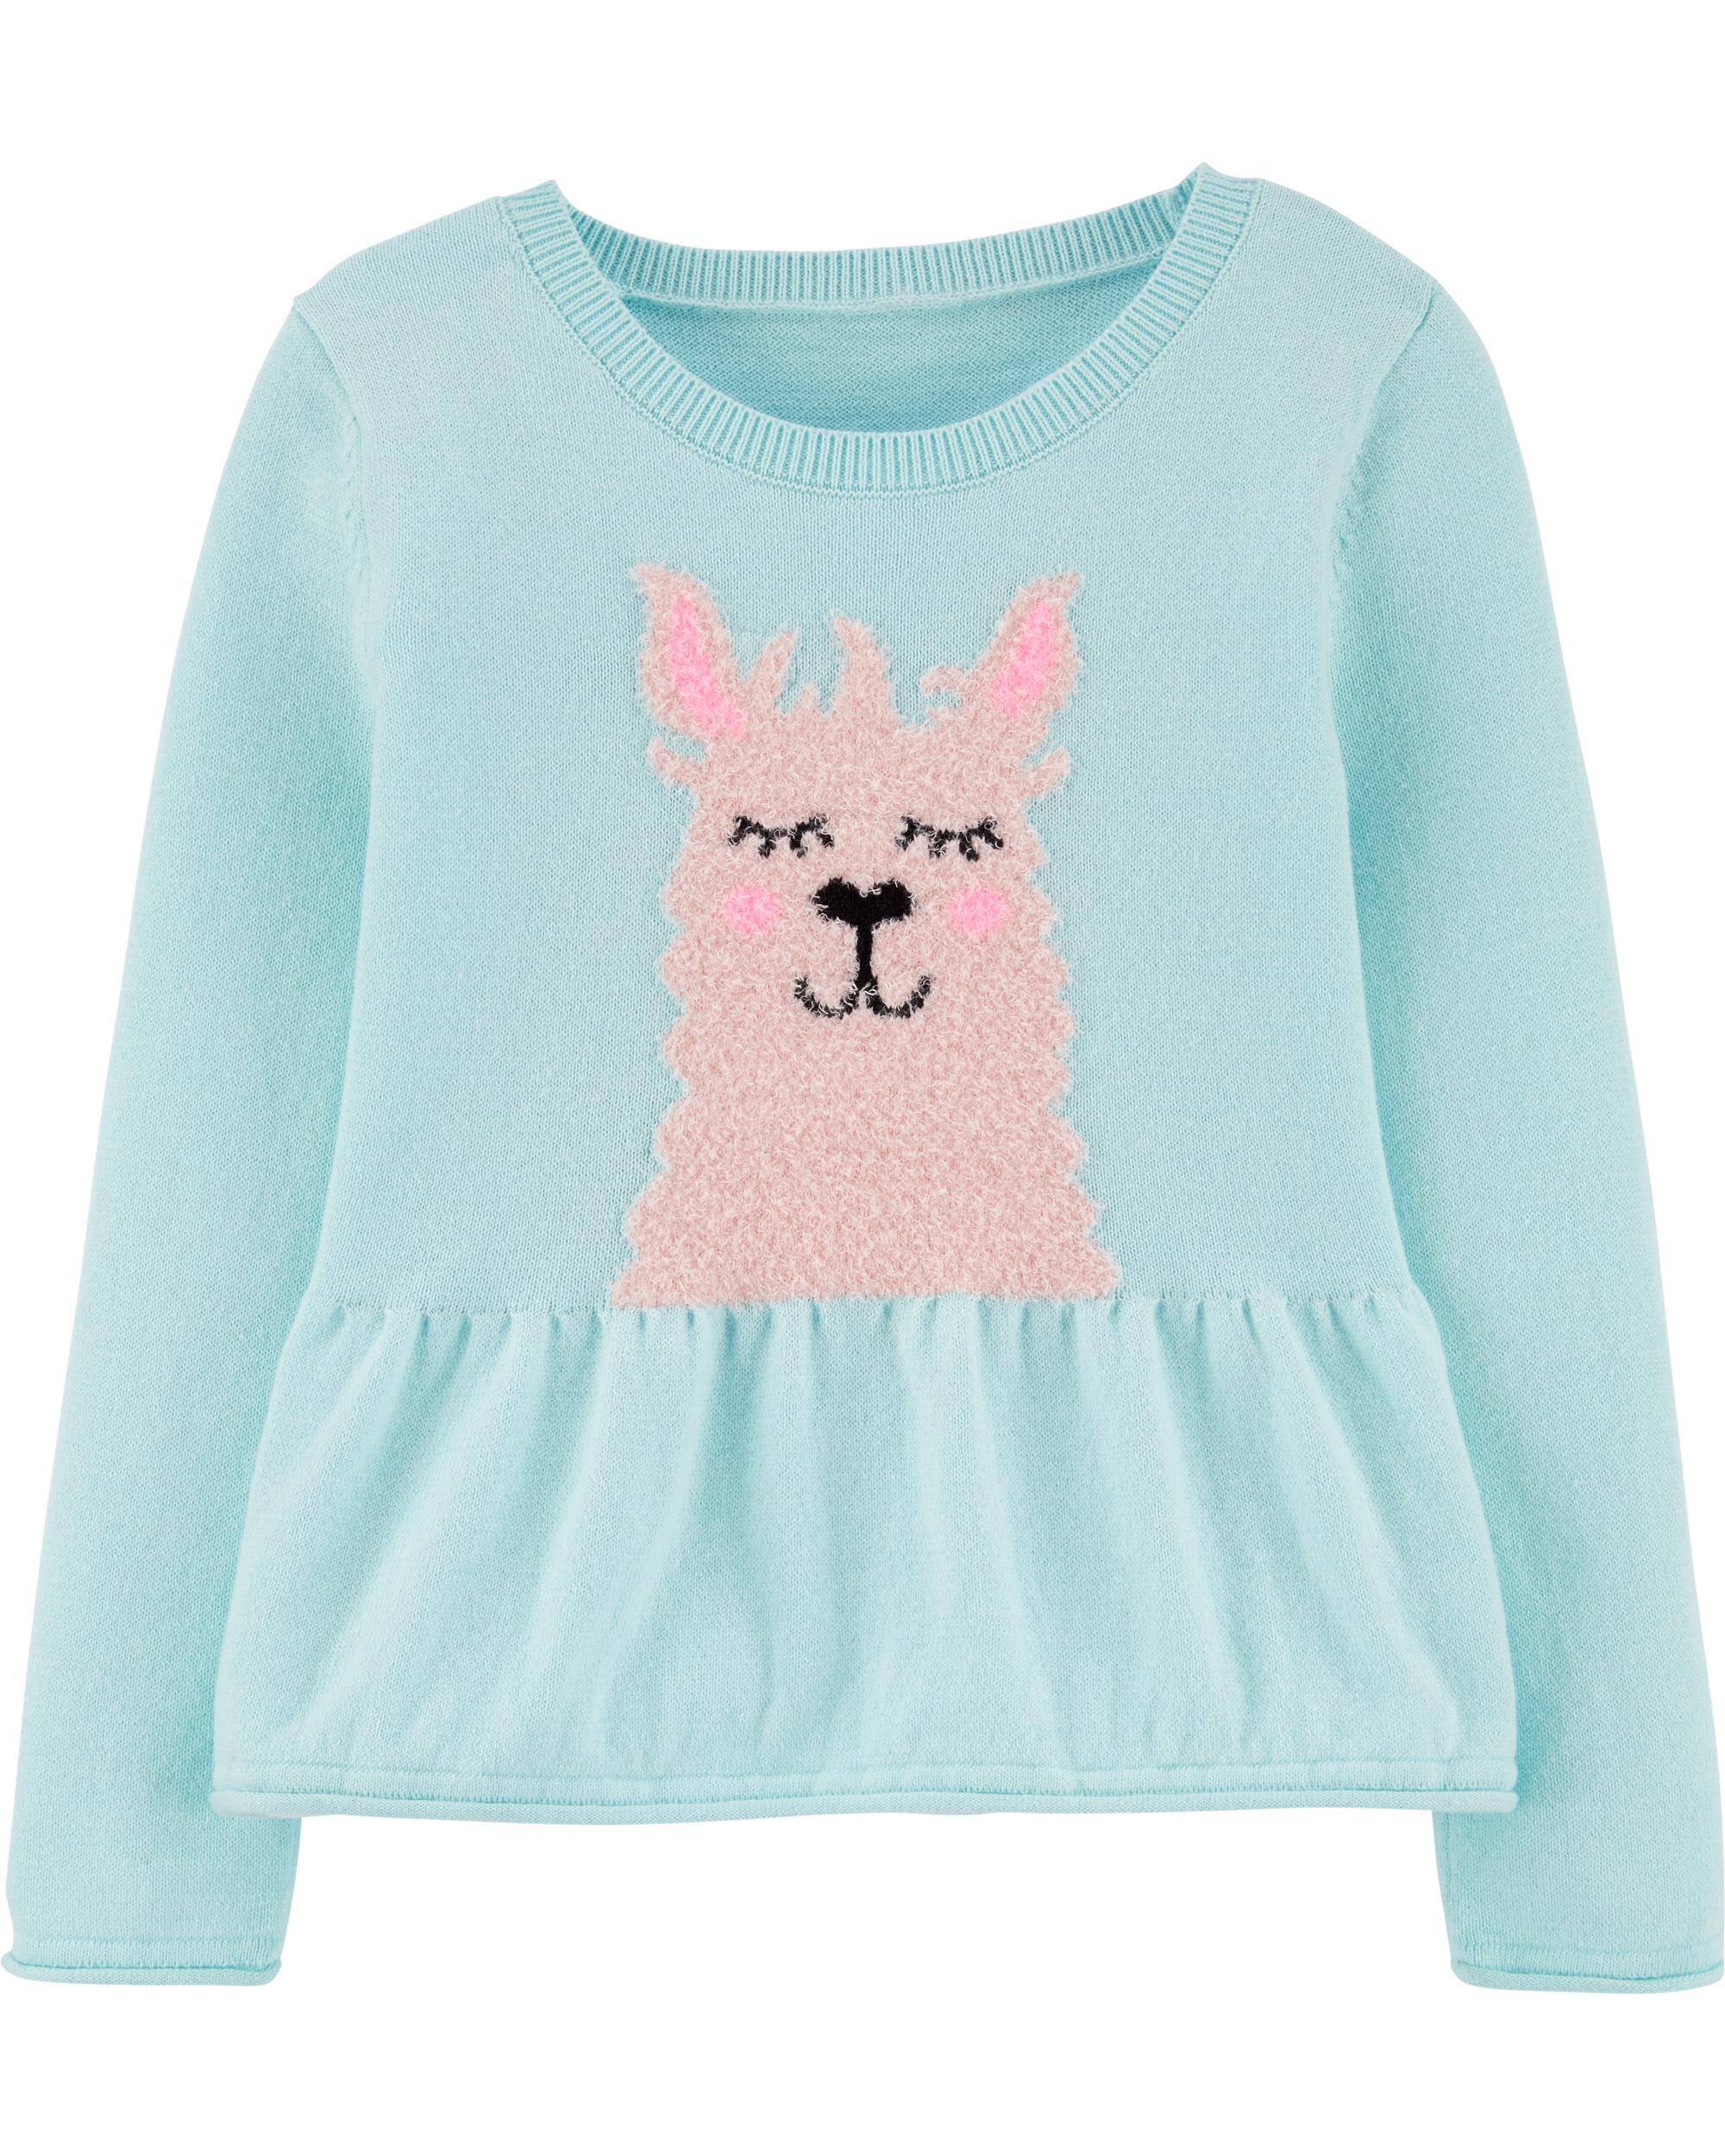 *Clearance*  Peplum Hem Llama Sweater